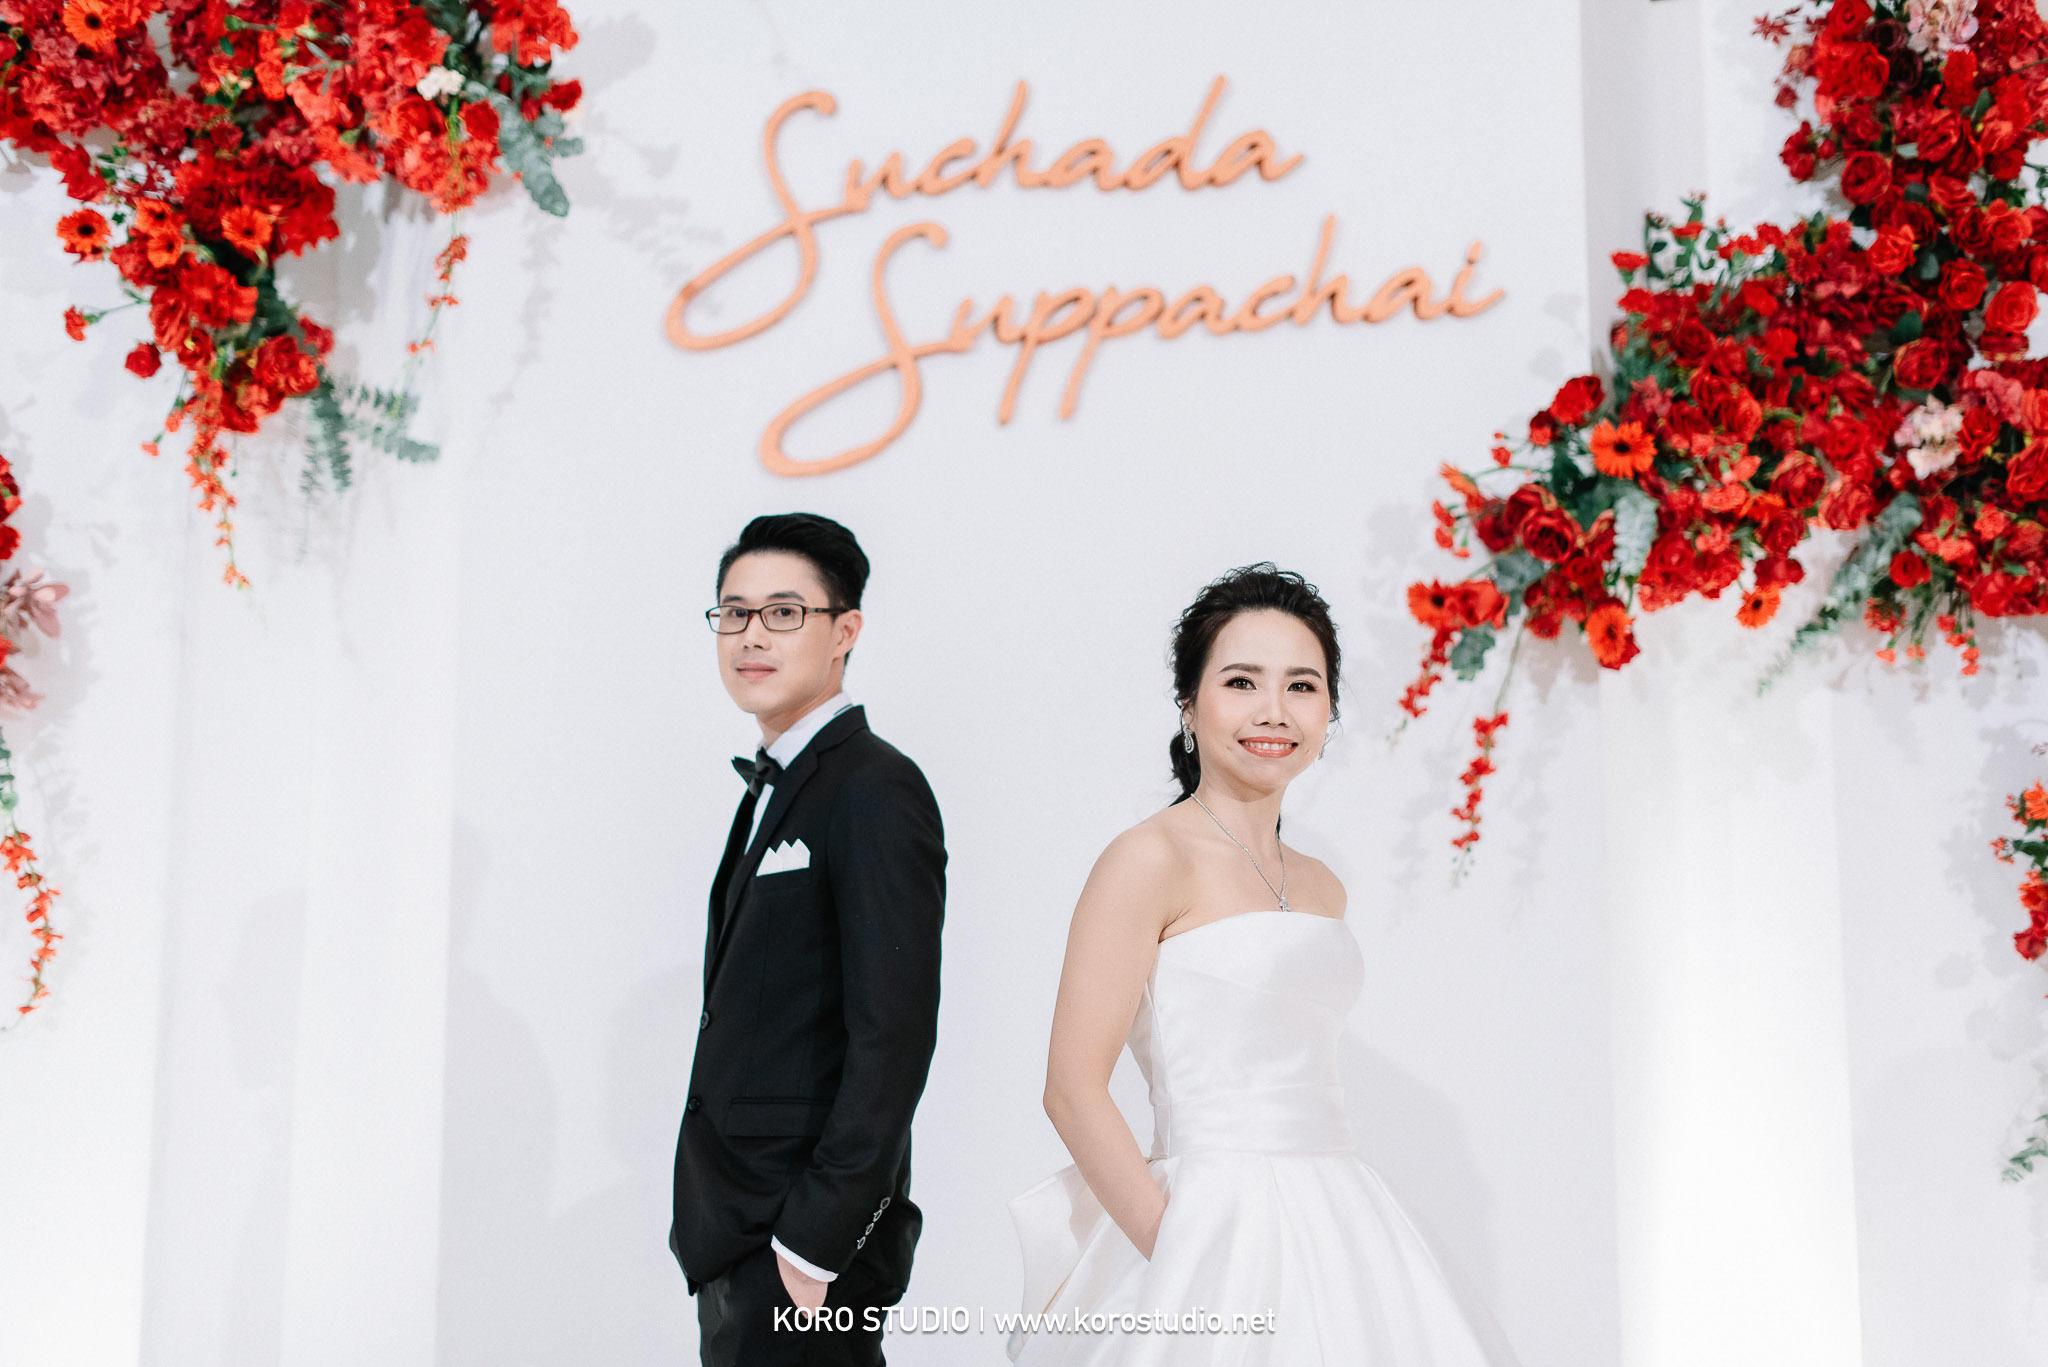 korostudio rama garden wedding reception 92 Rama Gardens Hotel Bangkok Wedding Reception Ae and Beer - งานเลี้ยงฉลองมงคลสมรส แต่งงาน คุณเอ๋ และคุณเบียร์ โรงแรมรามาการ์เด้นส์